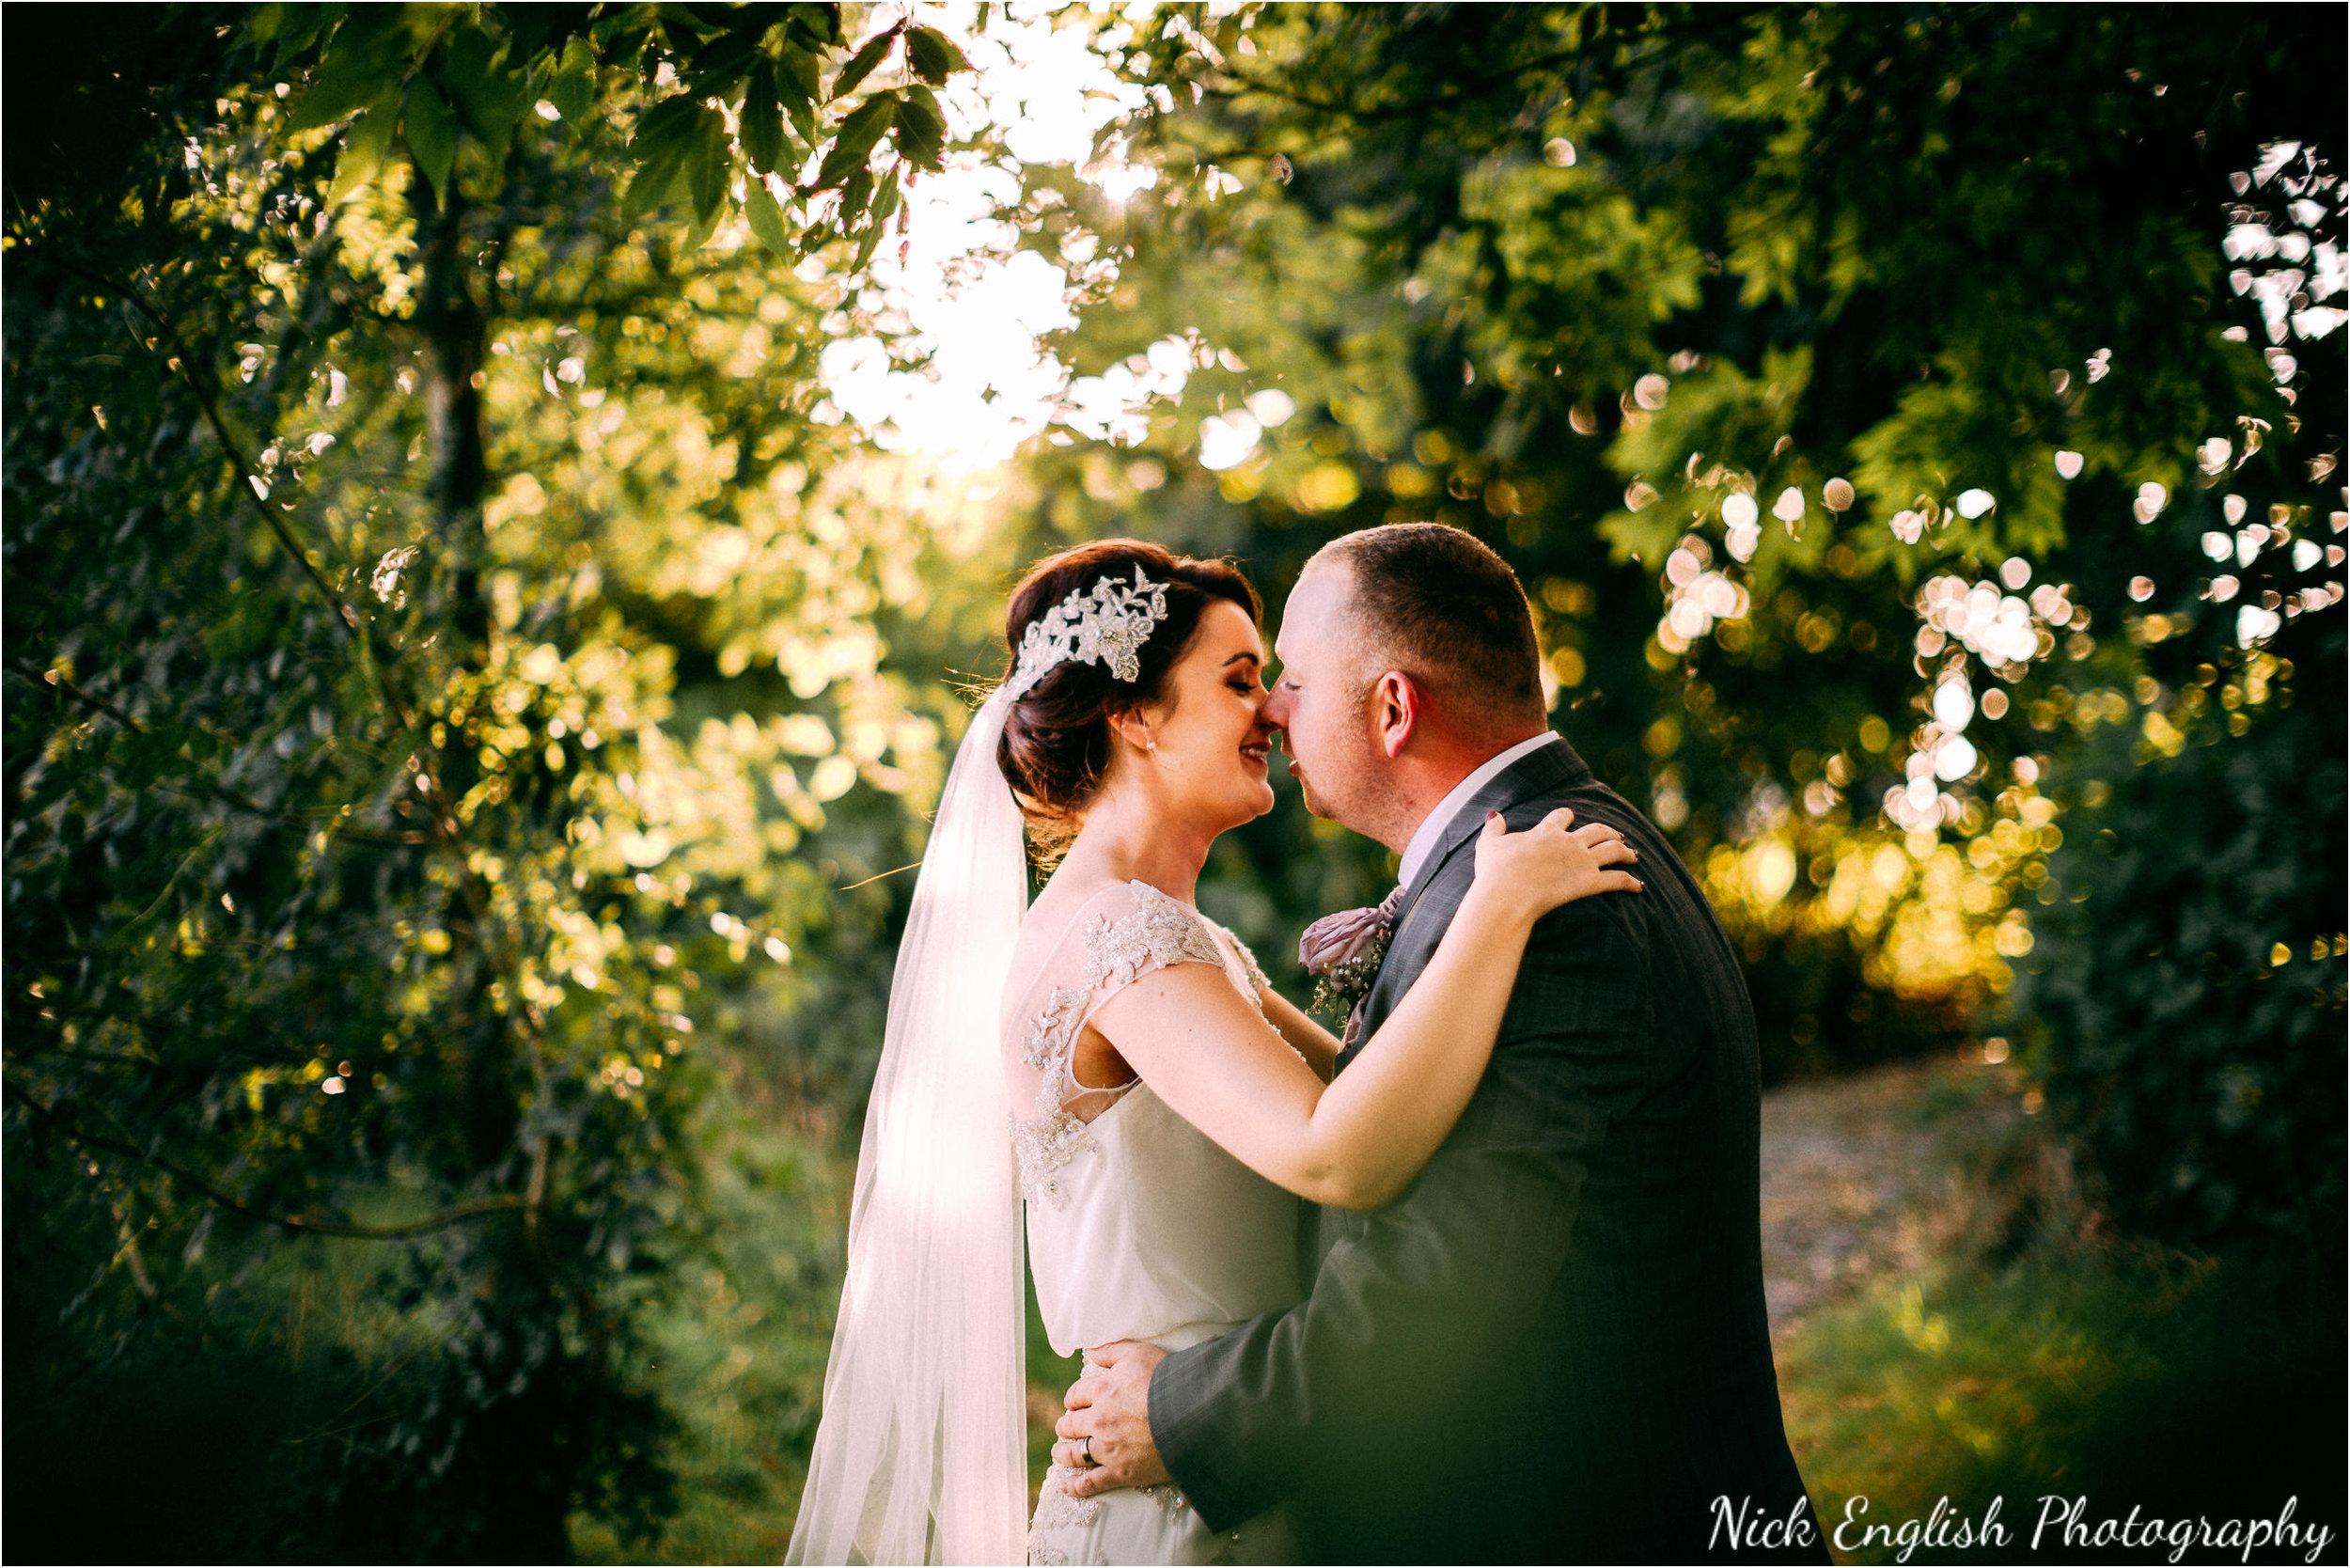 Stacey-Ash-Wedding-Photographs-Stanley-House-Preston-Lancashire-211.jpg